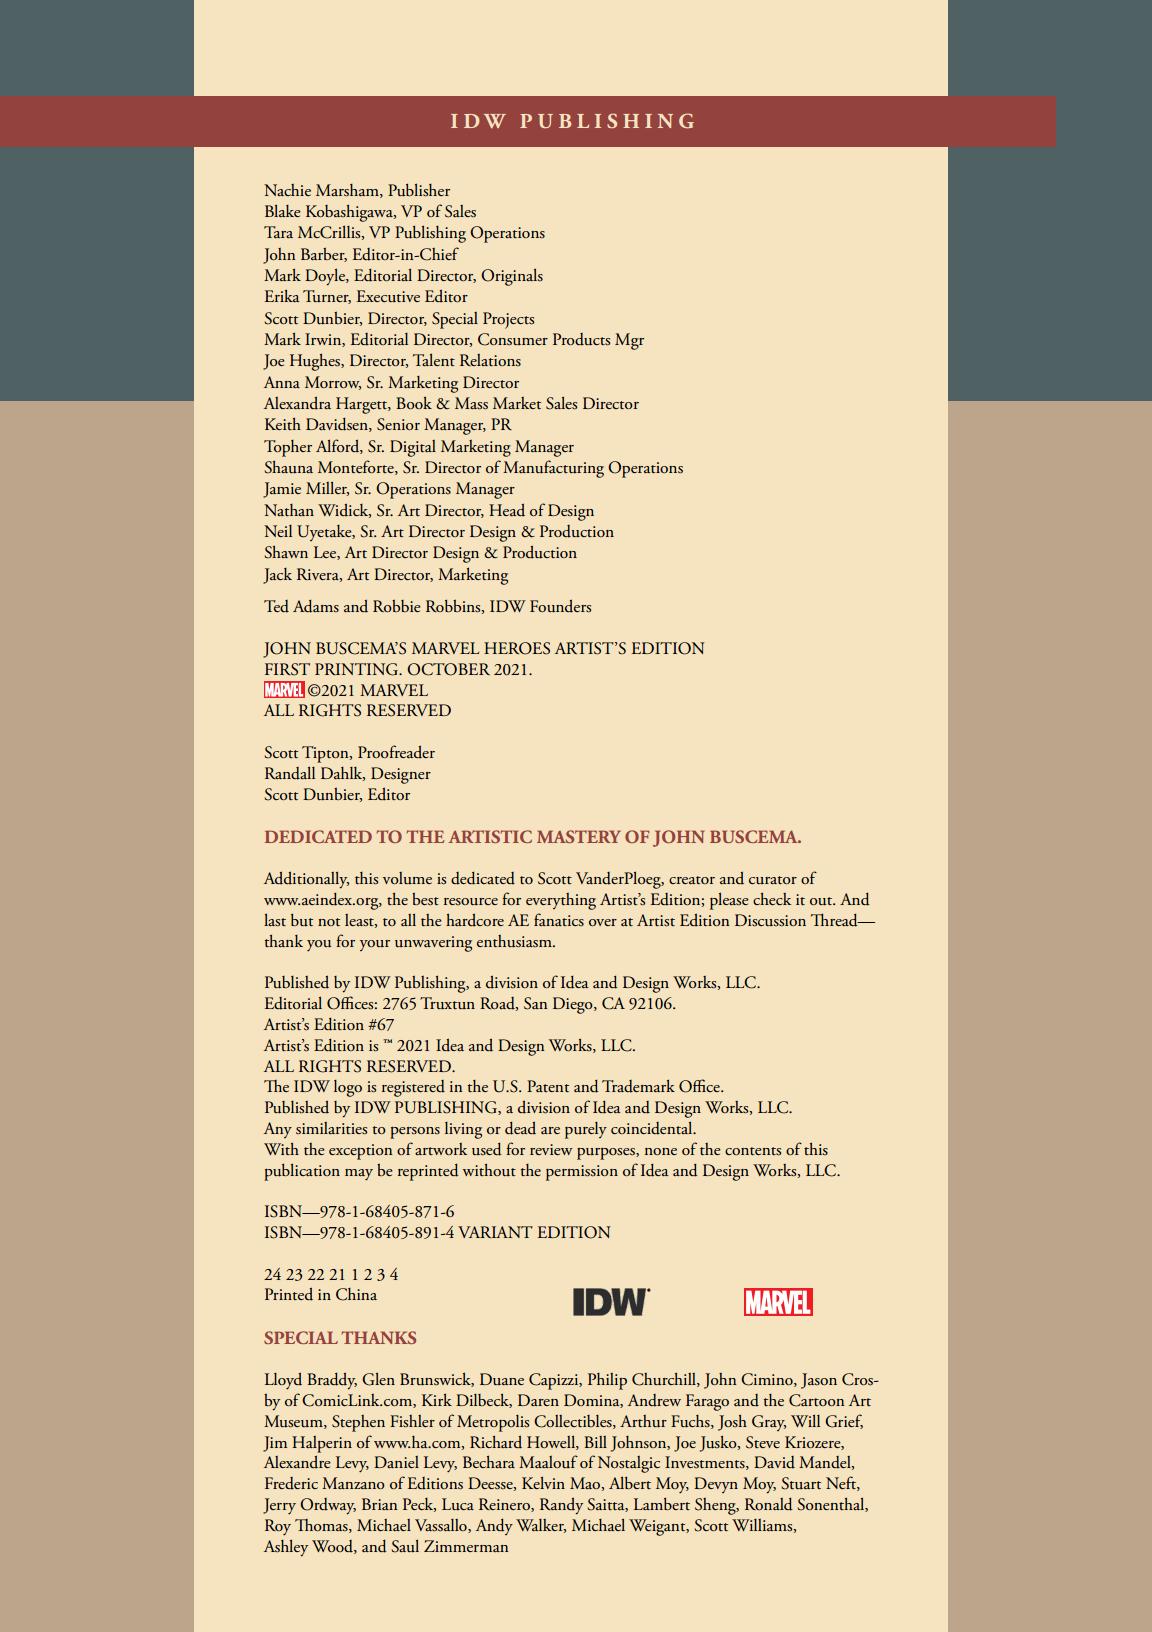 John Buscemas Marvel Heroes Artists Edition Dedication